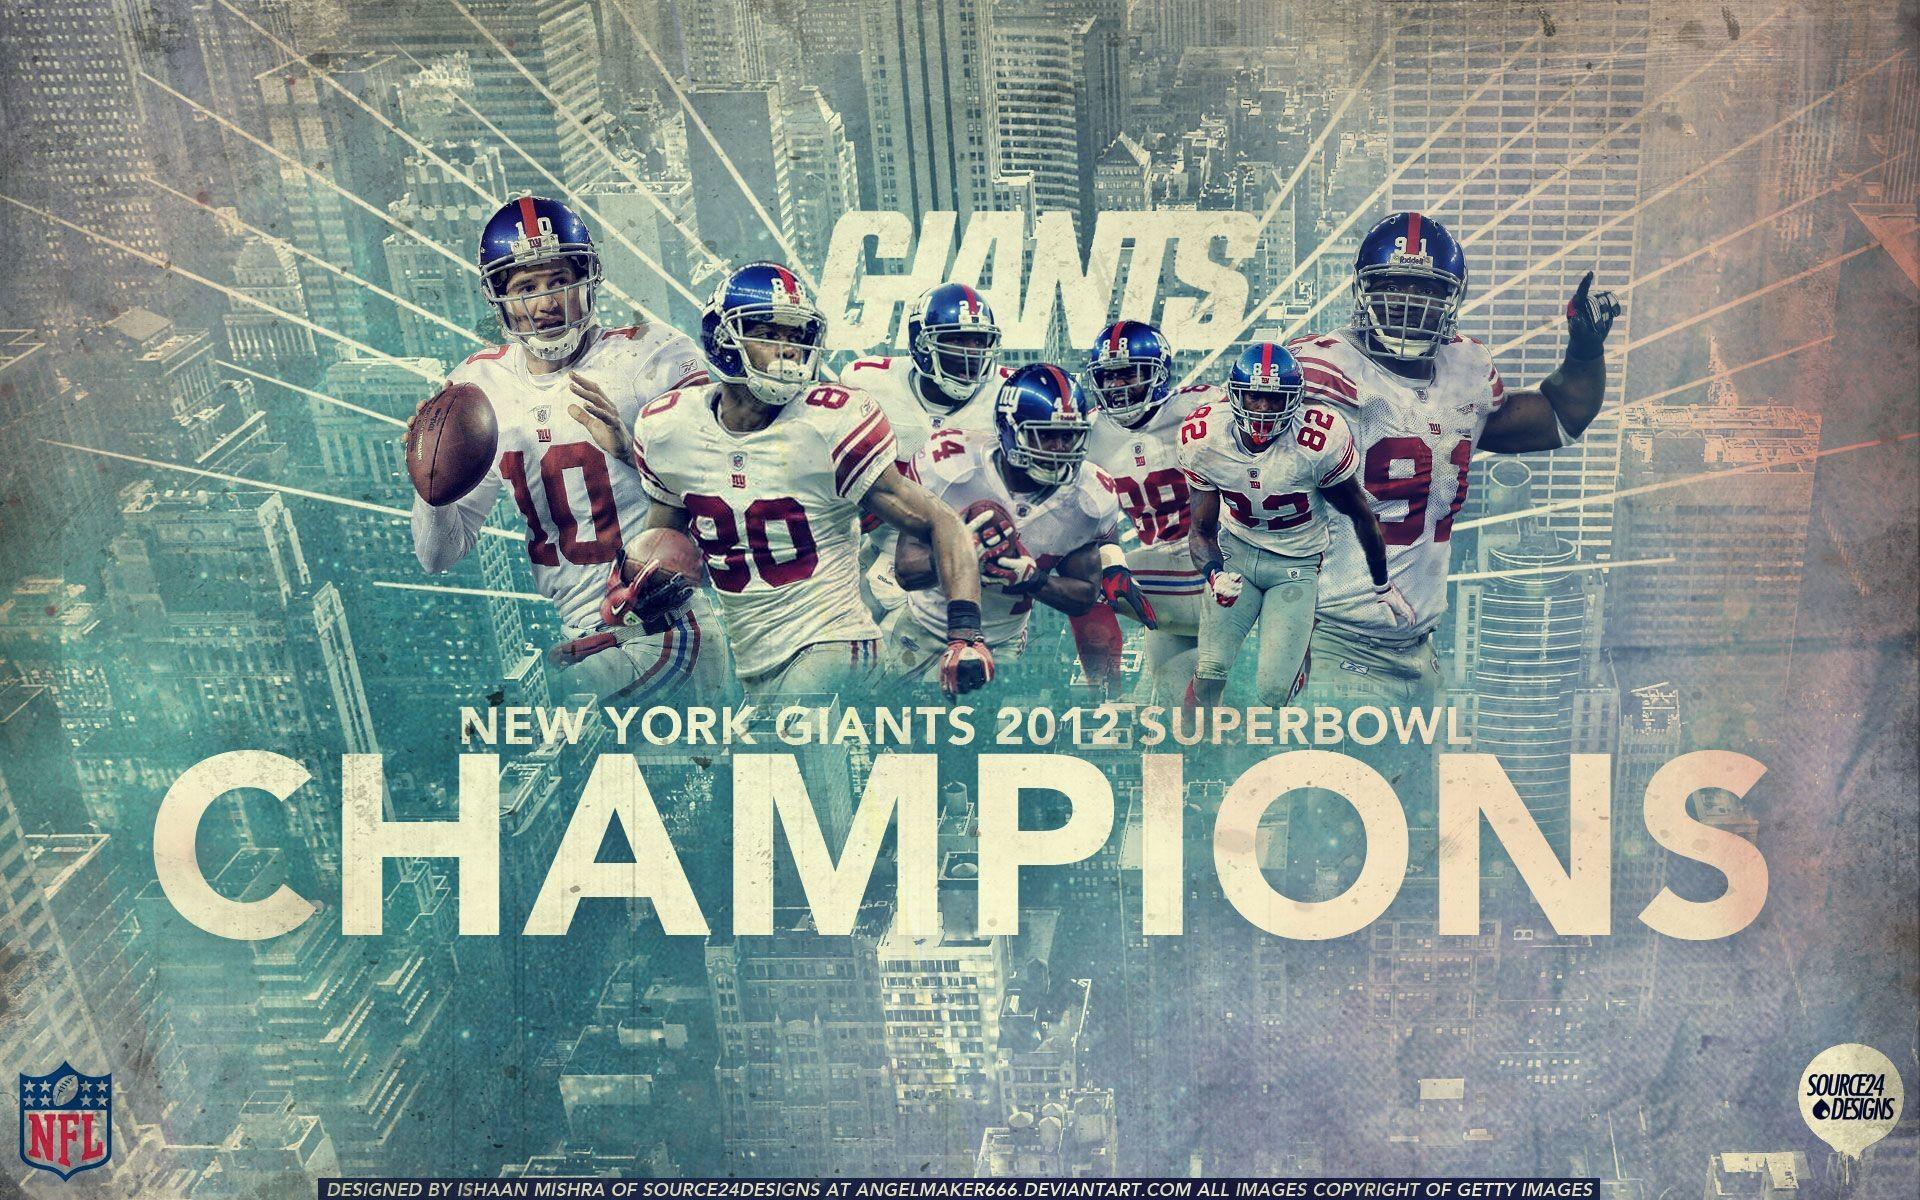 New York Giants Wallpapers HD Download